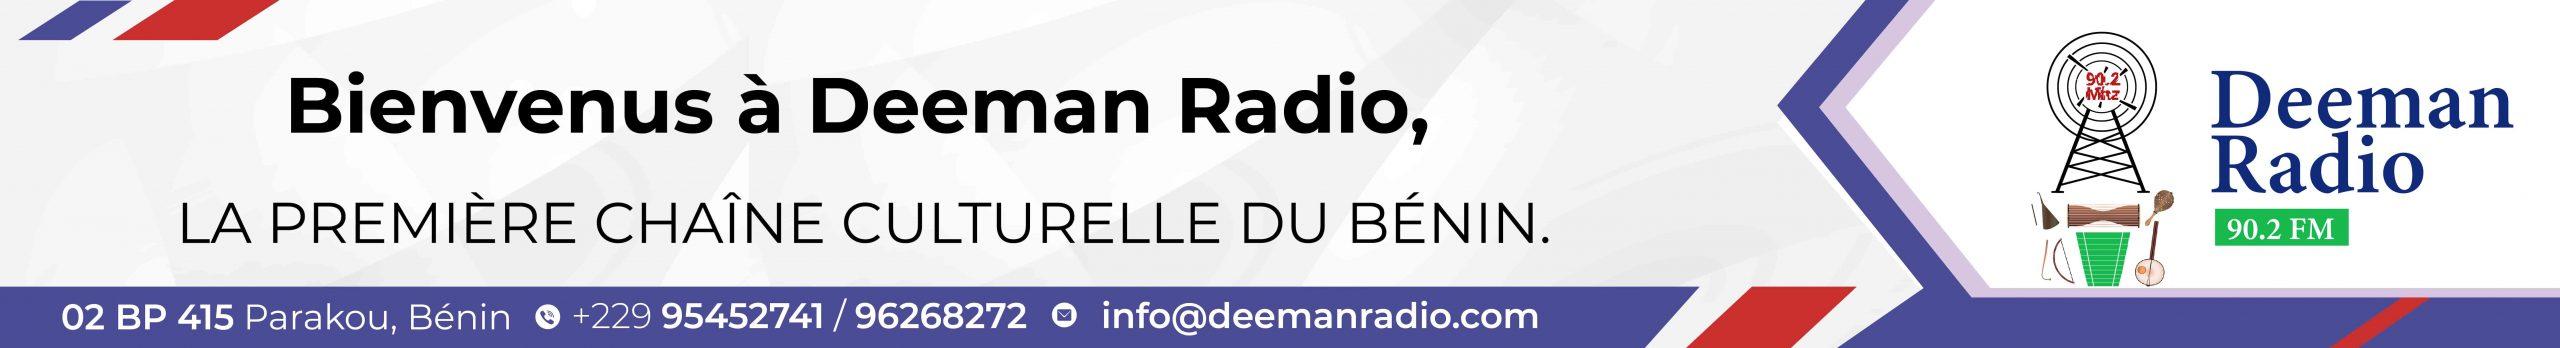 Deeman Radio